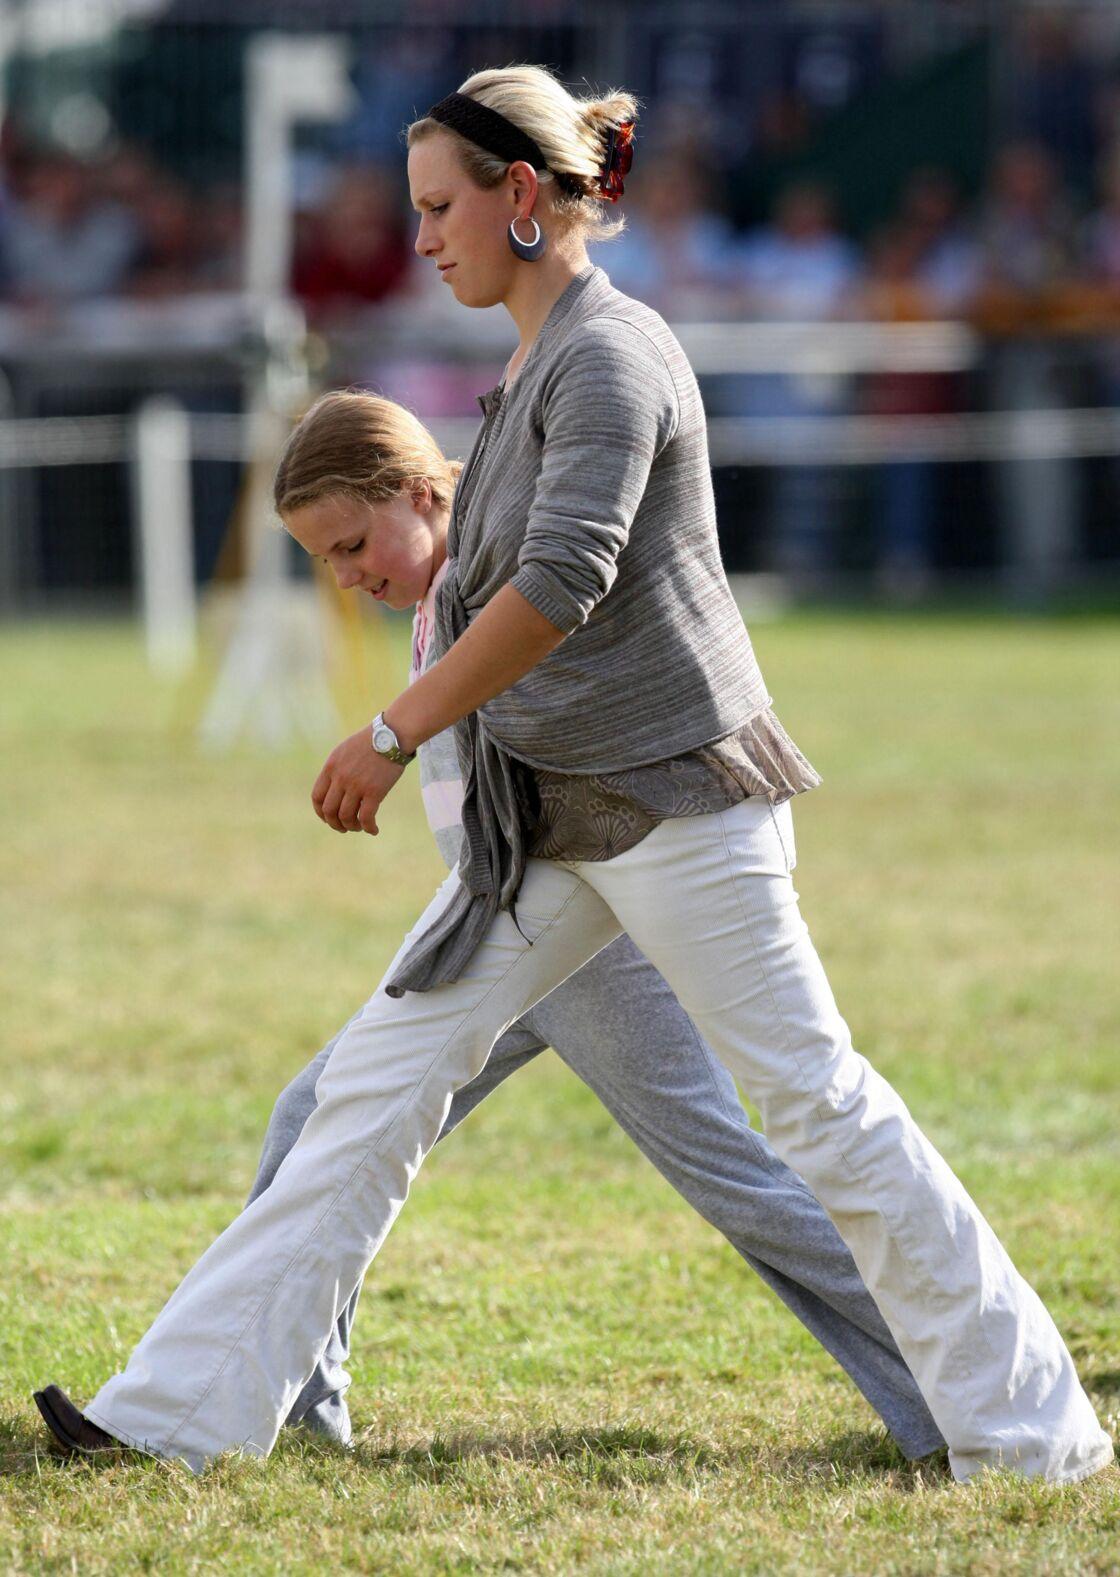 Zara Phillips et sa demi-soeur Stephanie Phillips, à Stamford en septembre 2007